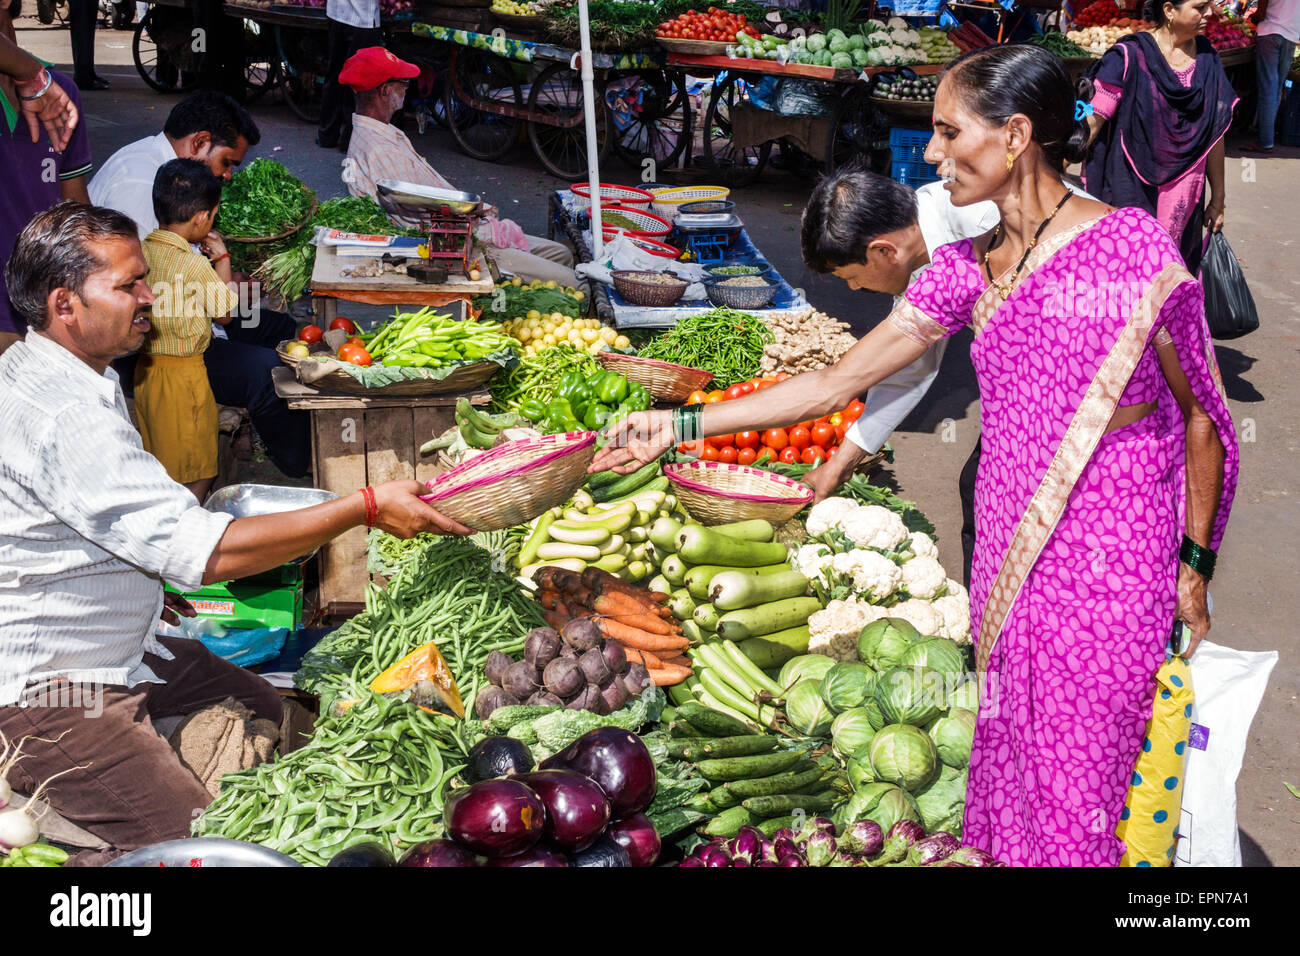 Mumbai India Asian Apollo Bandar Colaba Causeway Market Lala Nigam Road shopping street produce vendor vegetables - Stock Image